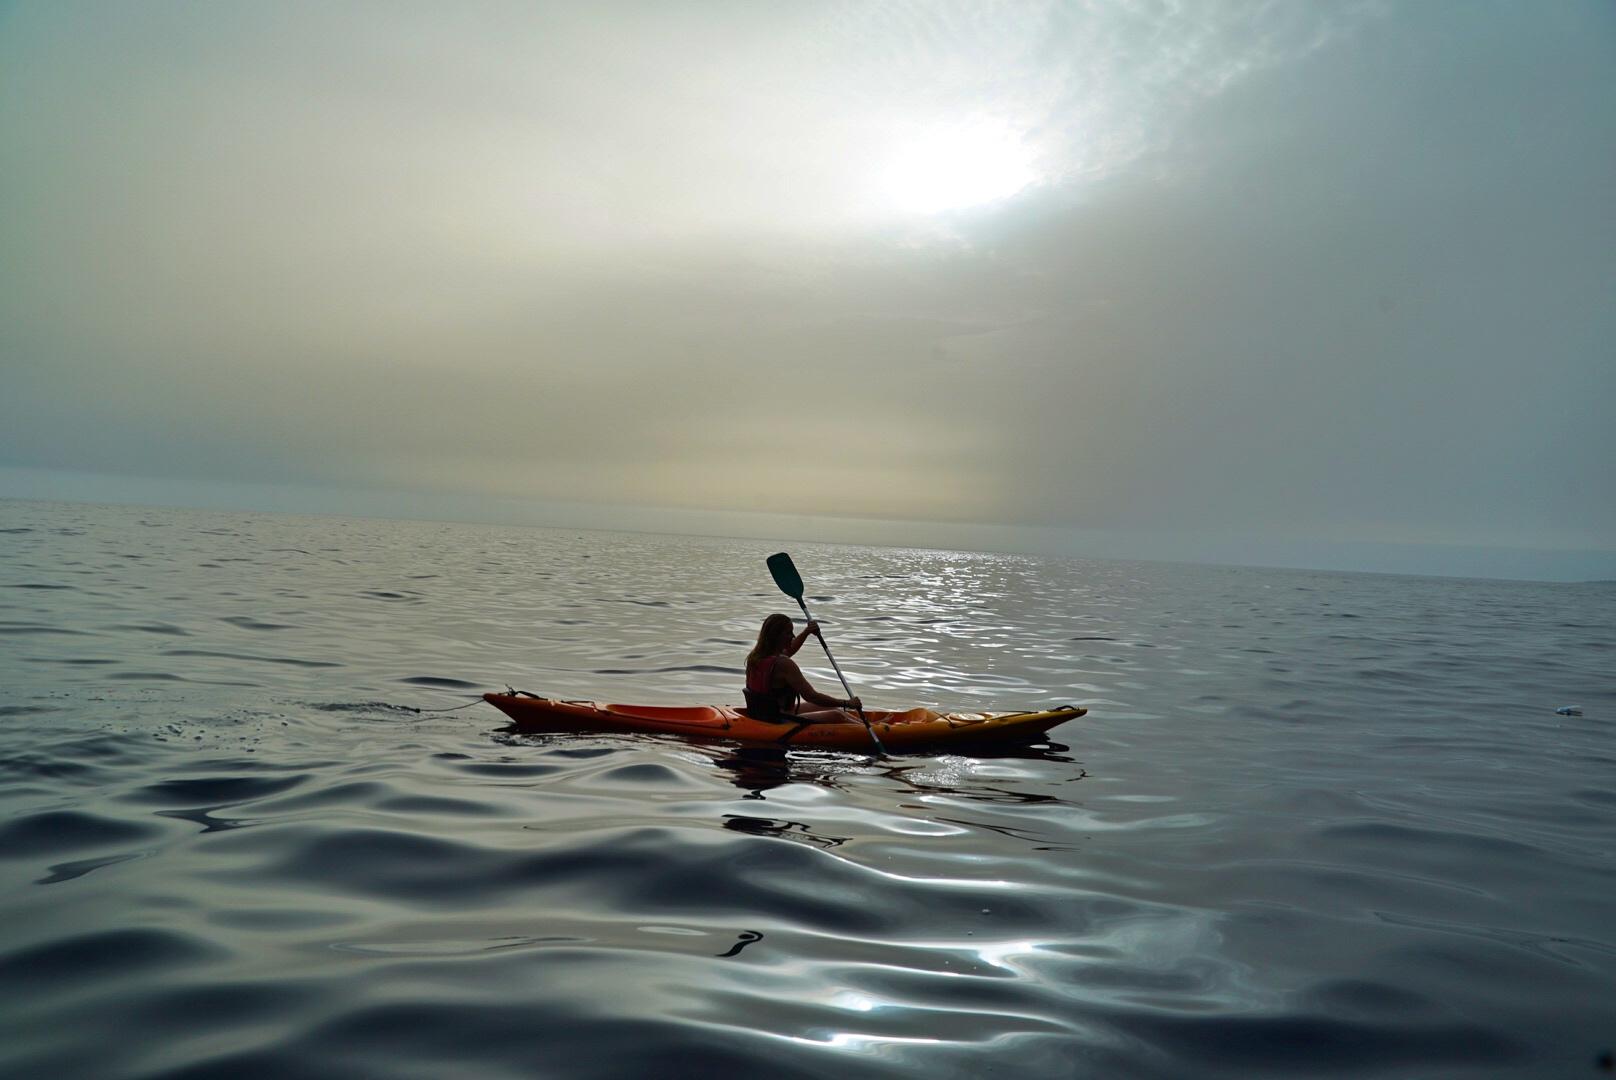 Tenerife kayaking Adventures, Sophie Radcliffe, One Life, Live It